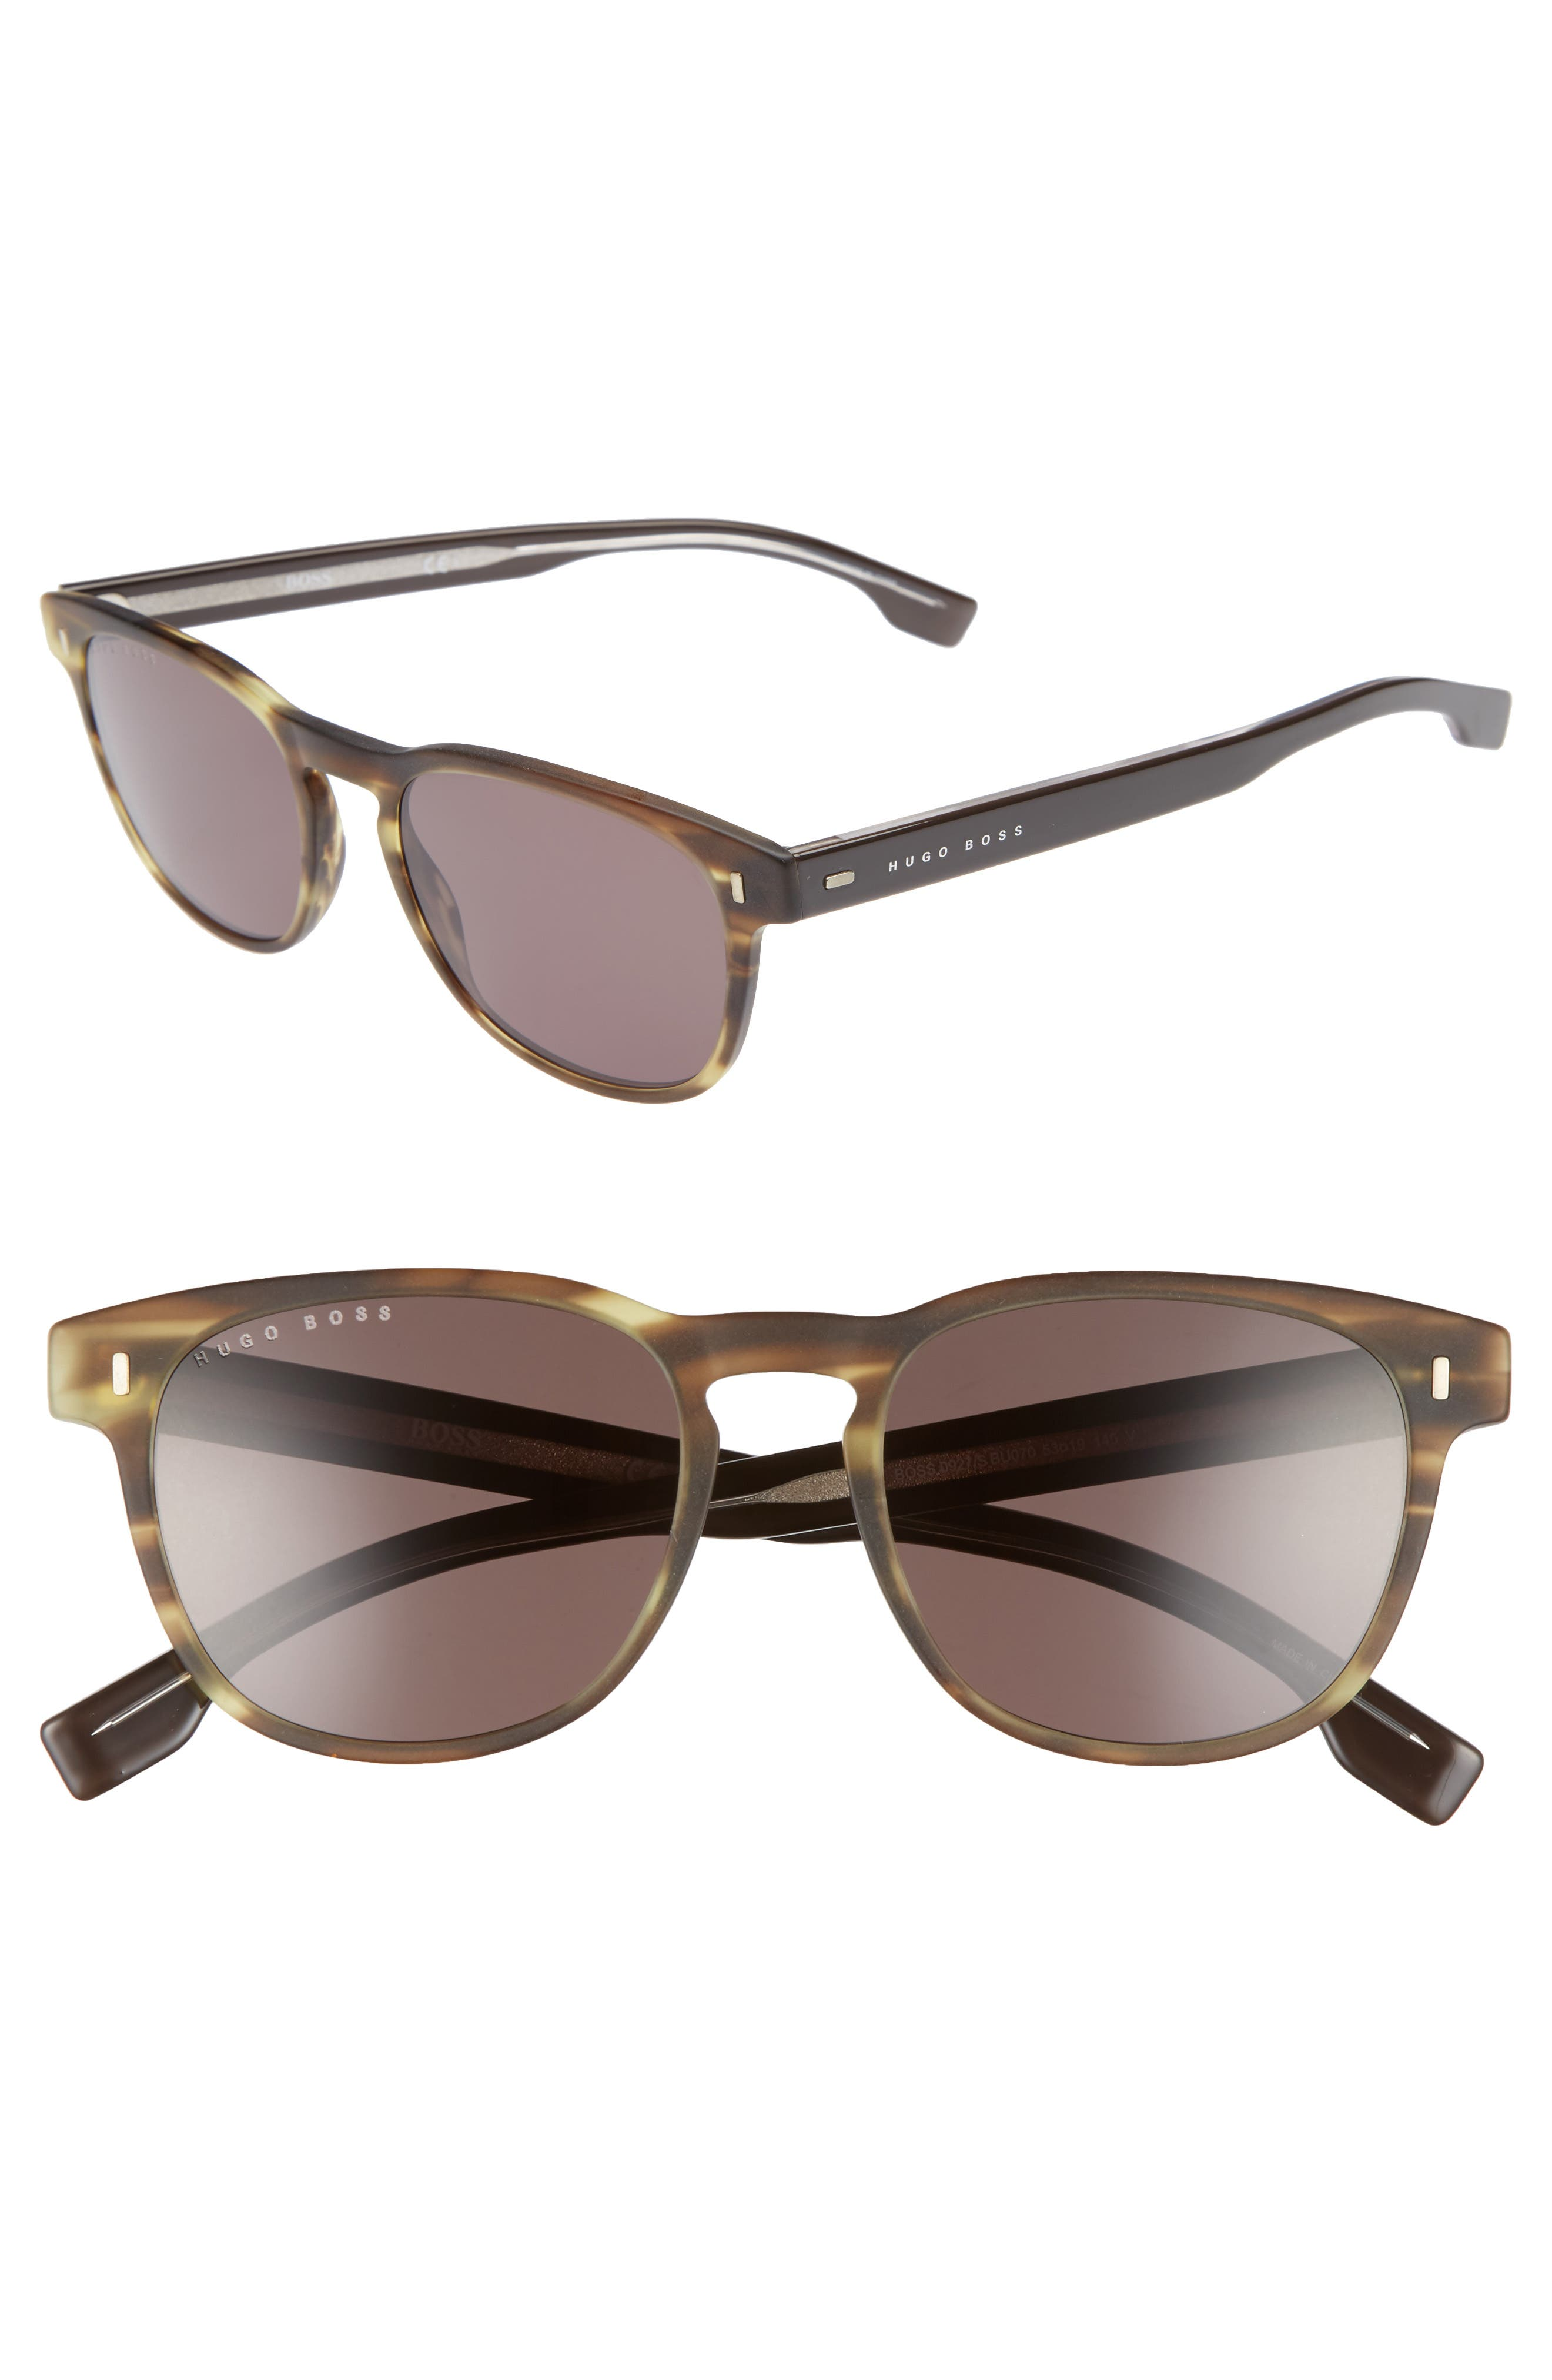 B0926S 49mm Polarized Sunglasses,                             Main thumbnail 1, color,                             Brown/ Brown